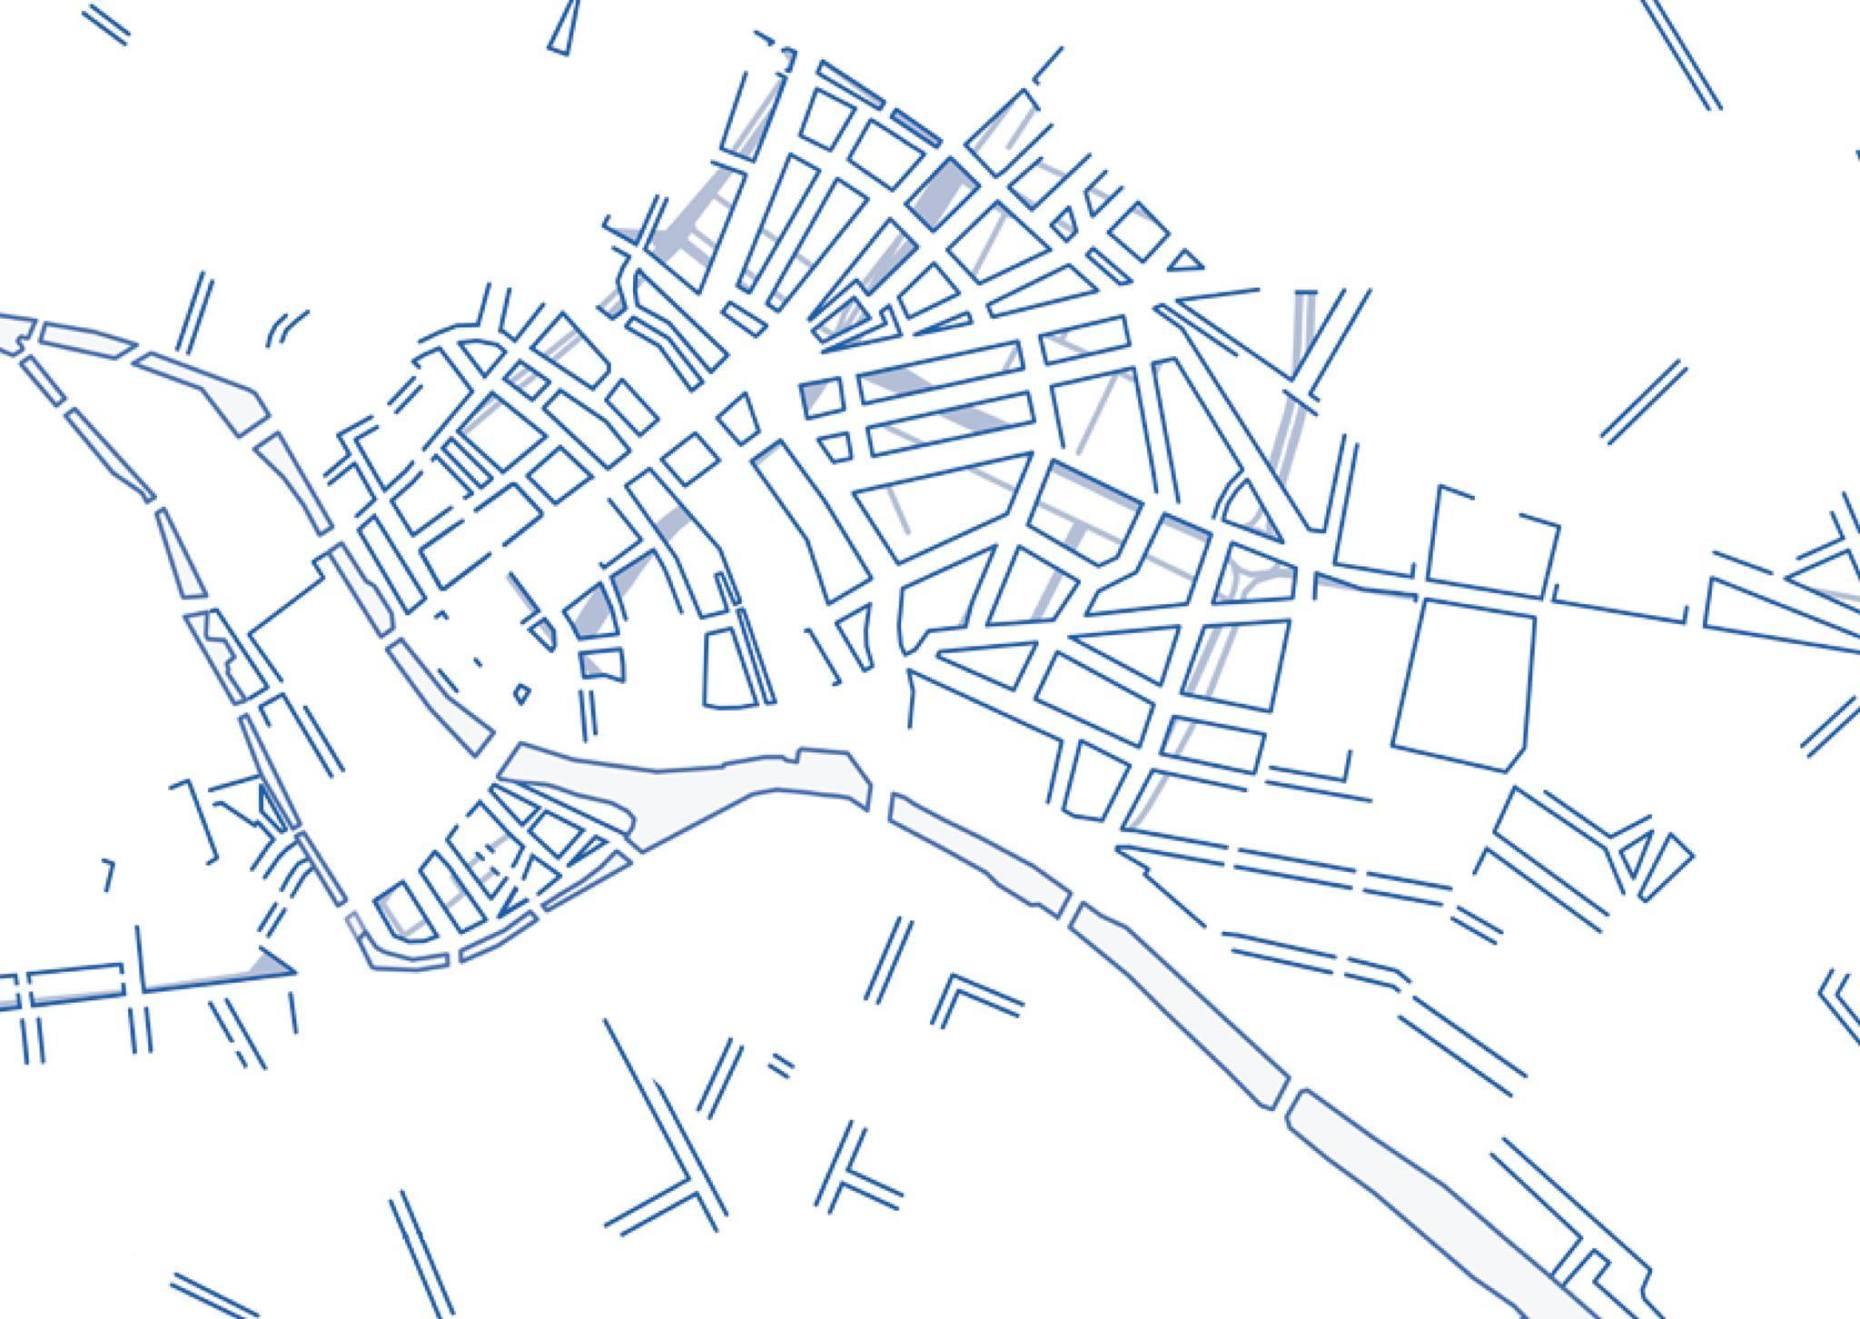 Sencer Vardarman Demolished Quarters Berlin - Ausschnitt 100x120cm, 2017 Digital Print Mounted on Forex